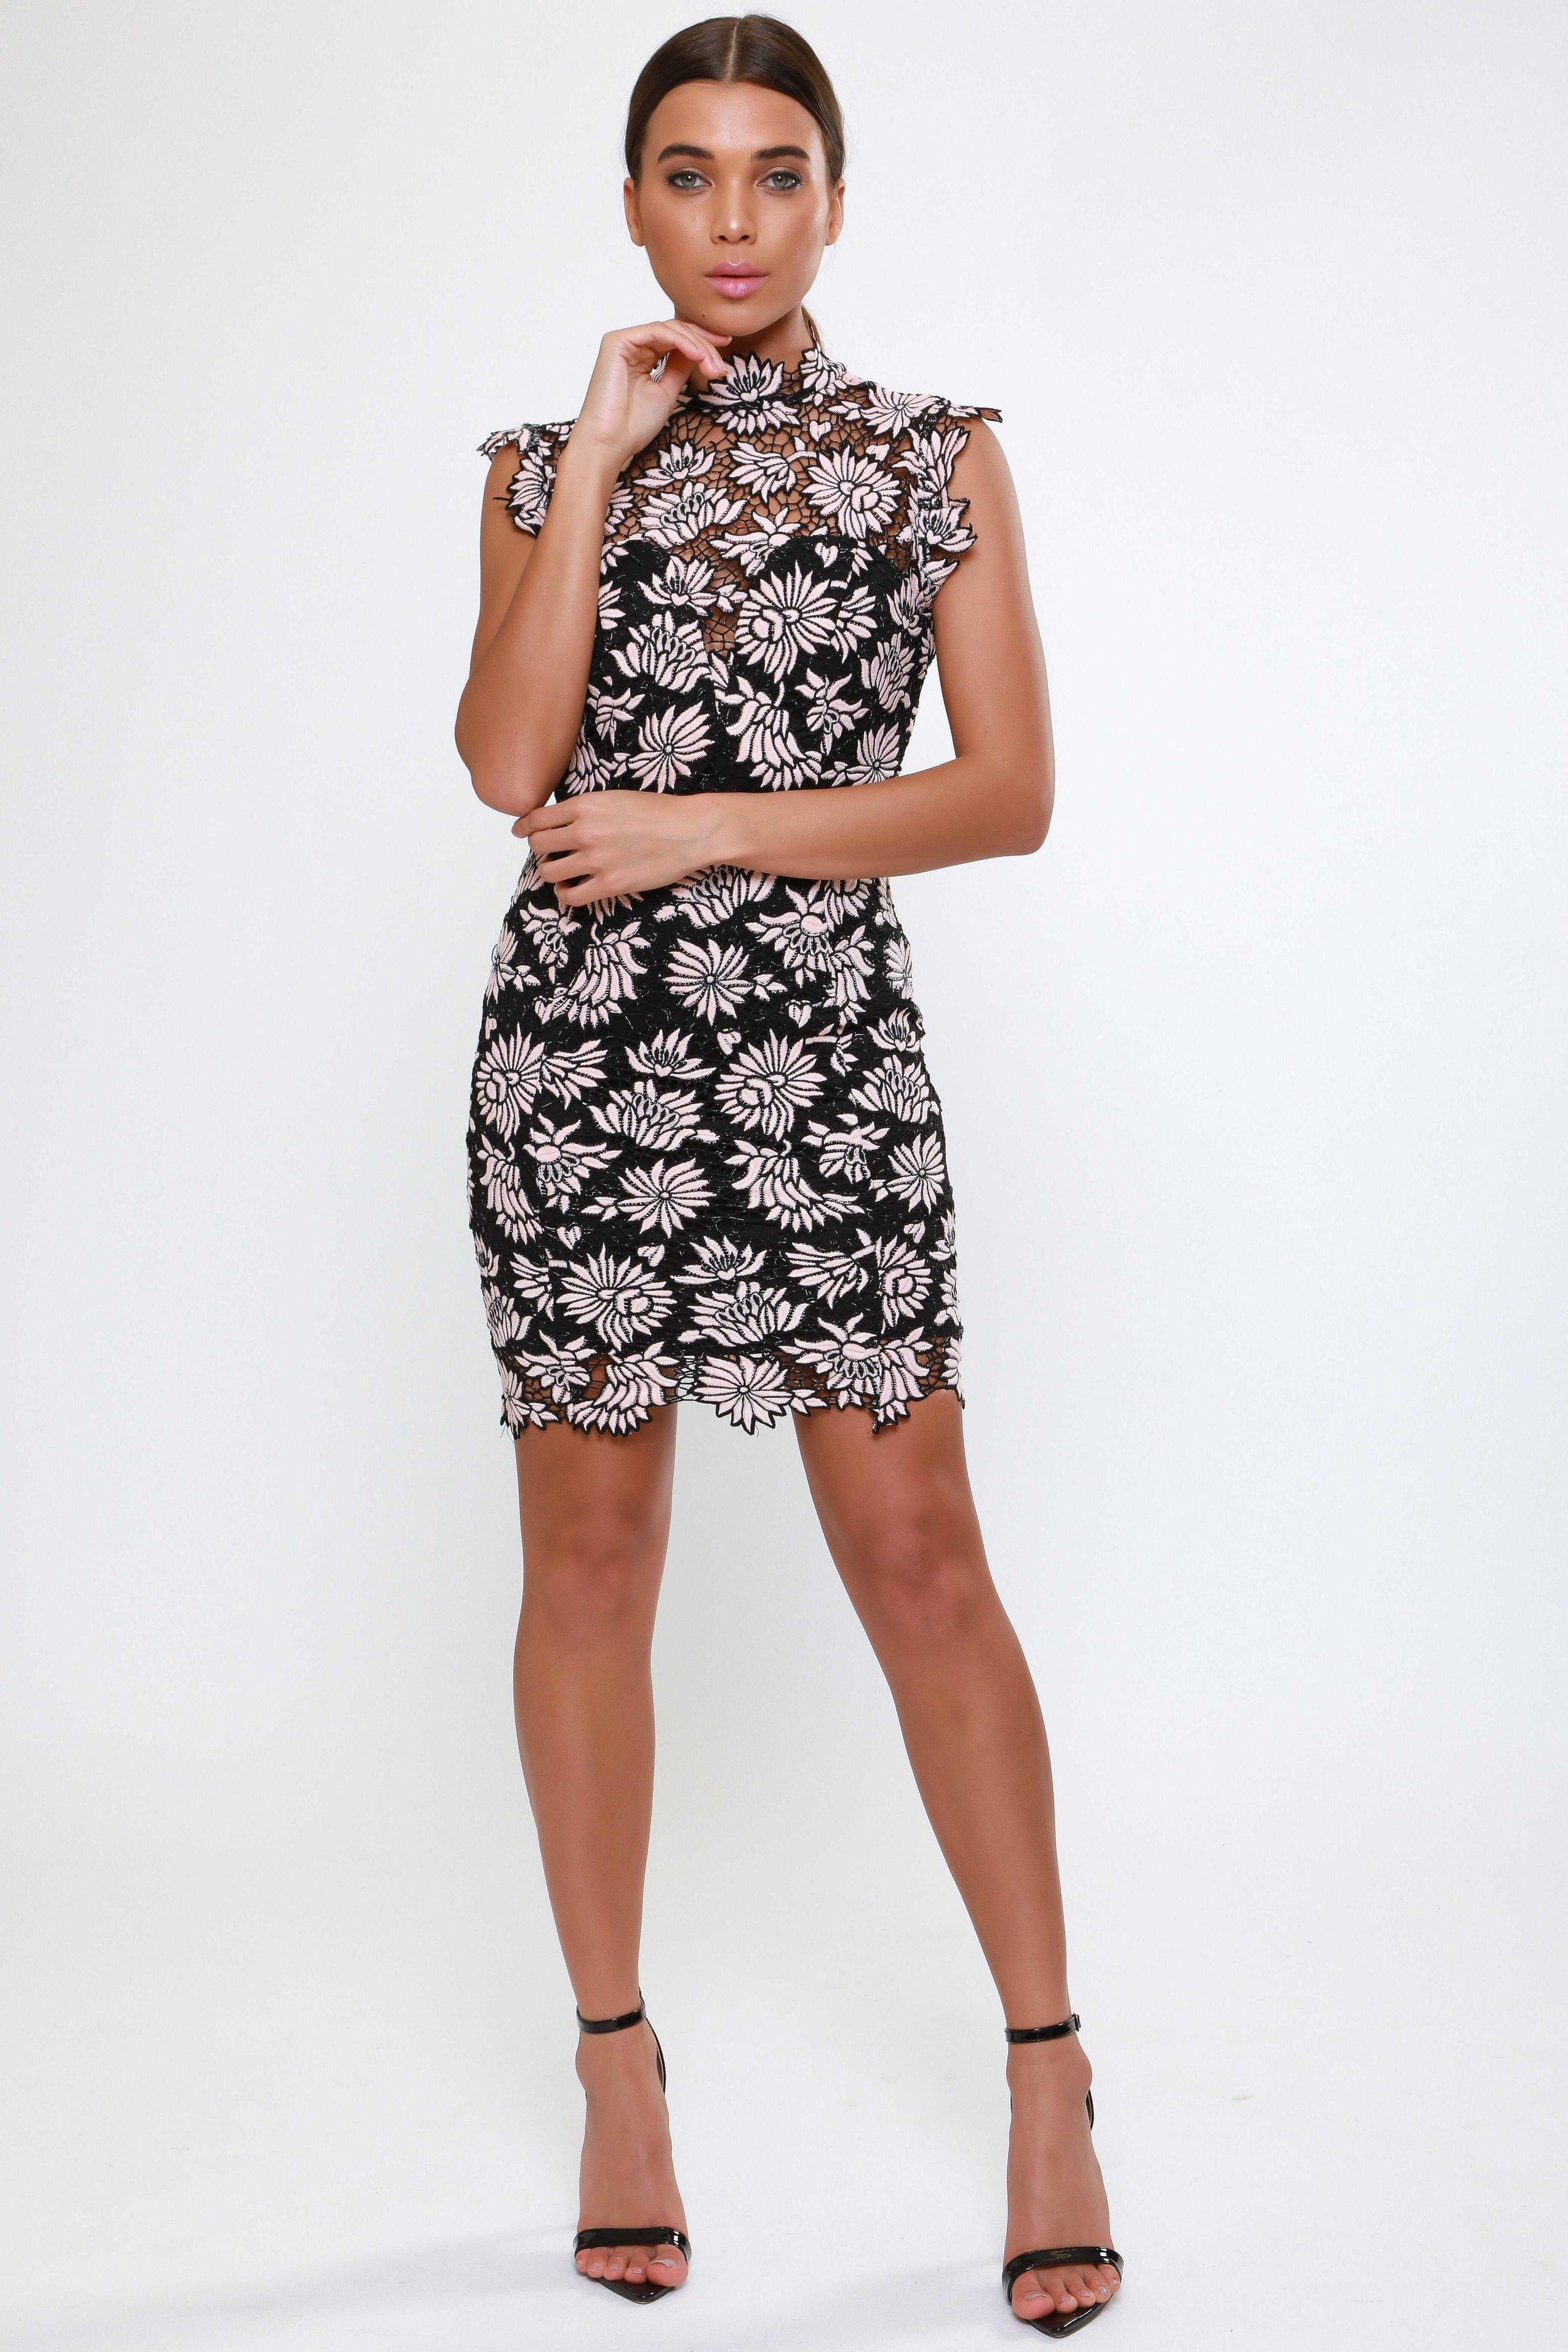 High Neck Crochet Lace Mini  Bodycon Dress   £75.00